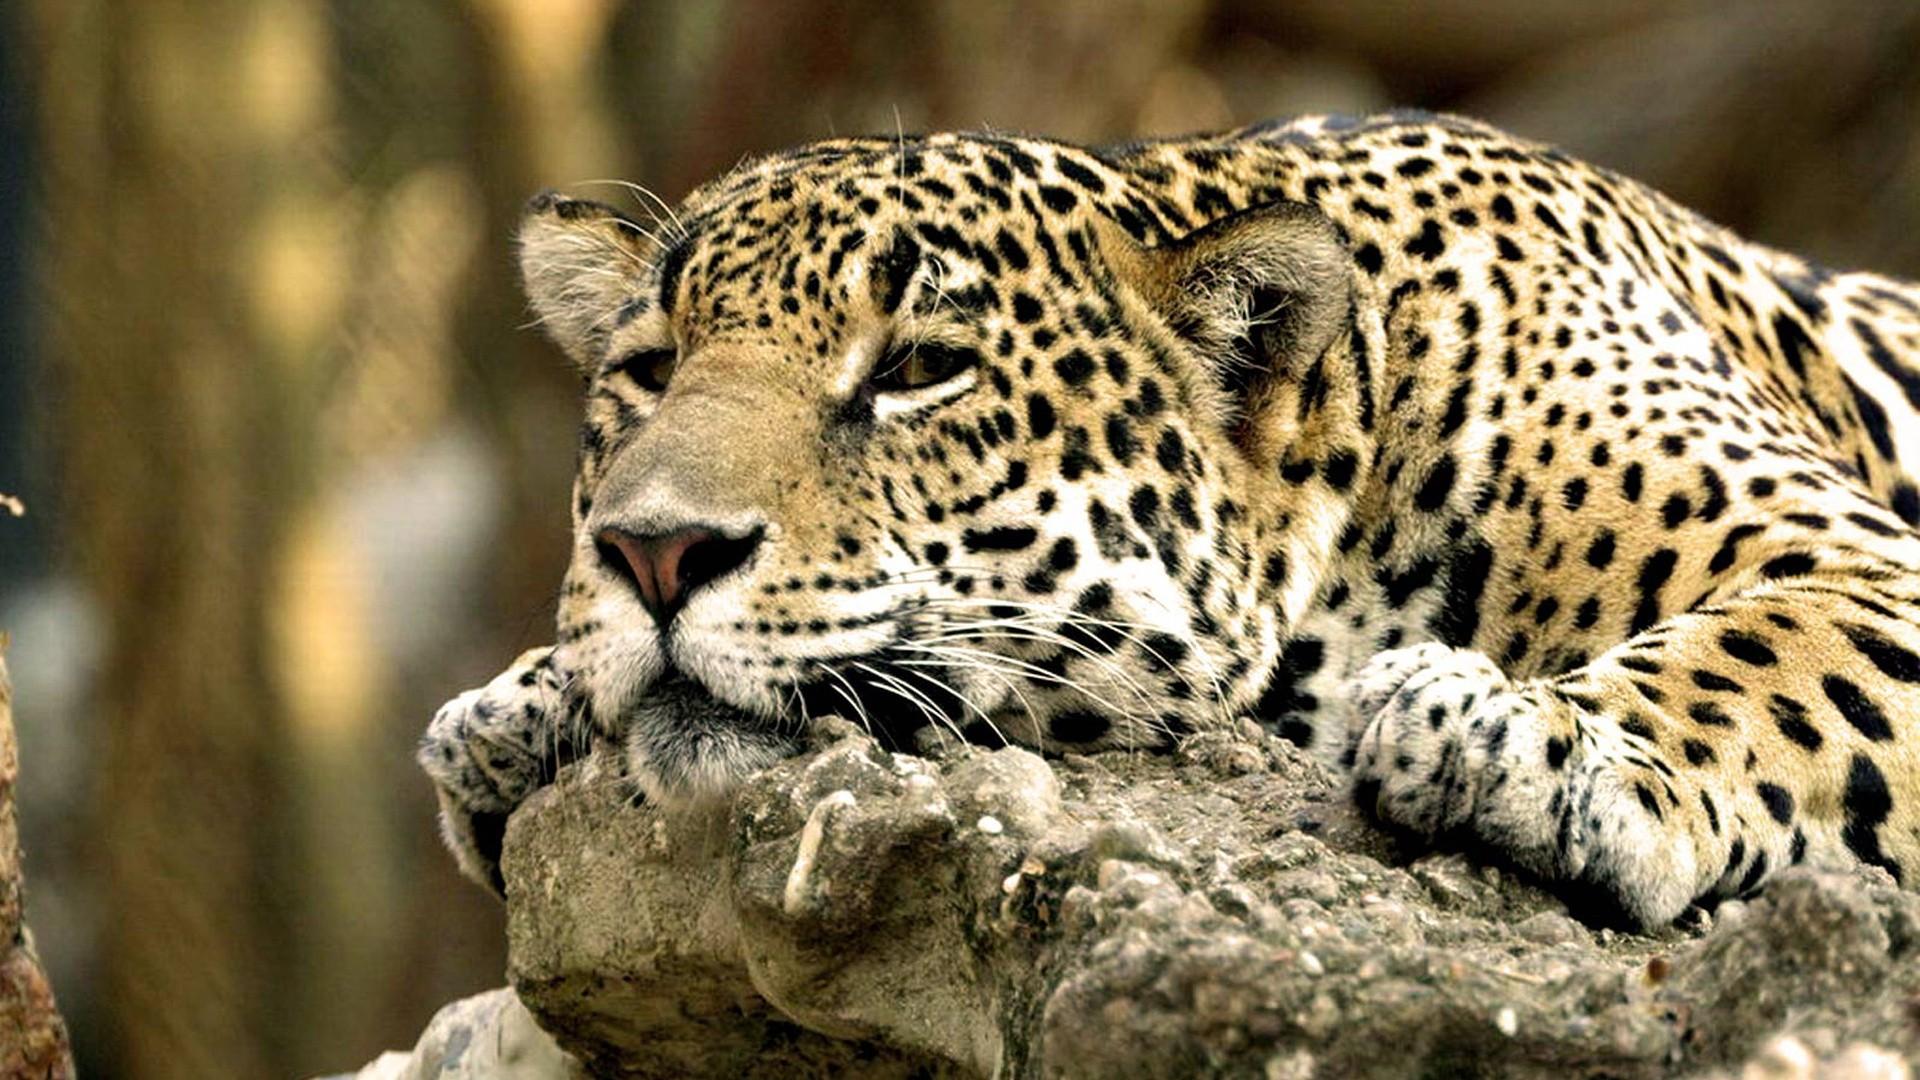 African animals wallpaper hd - photo#28